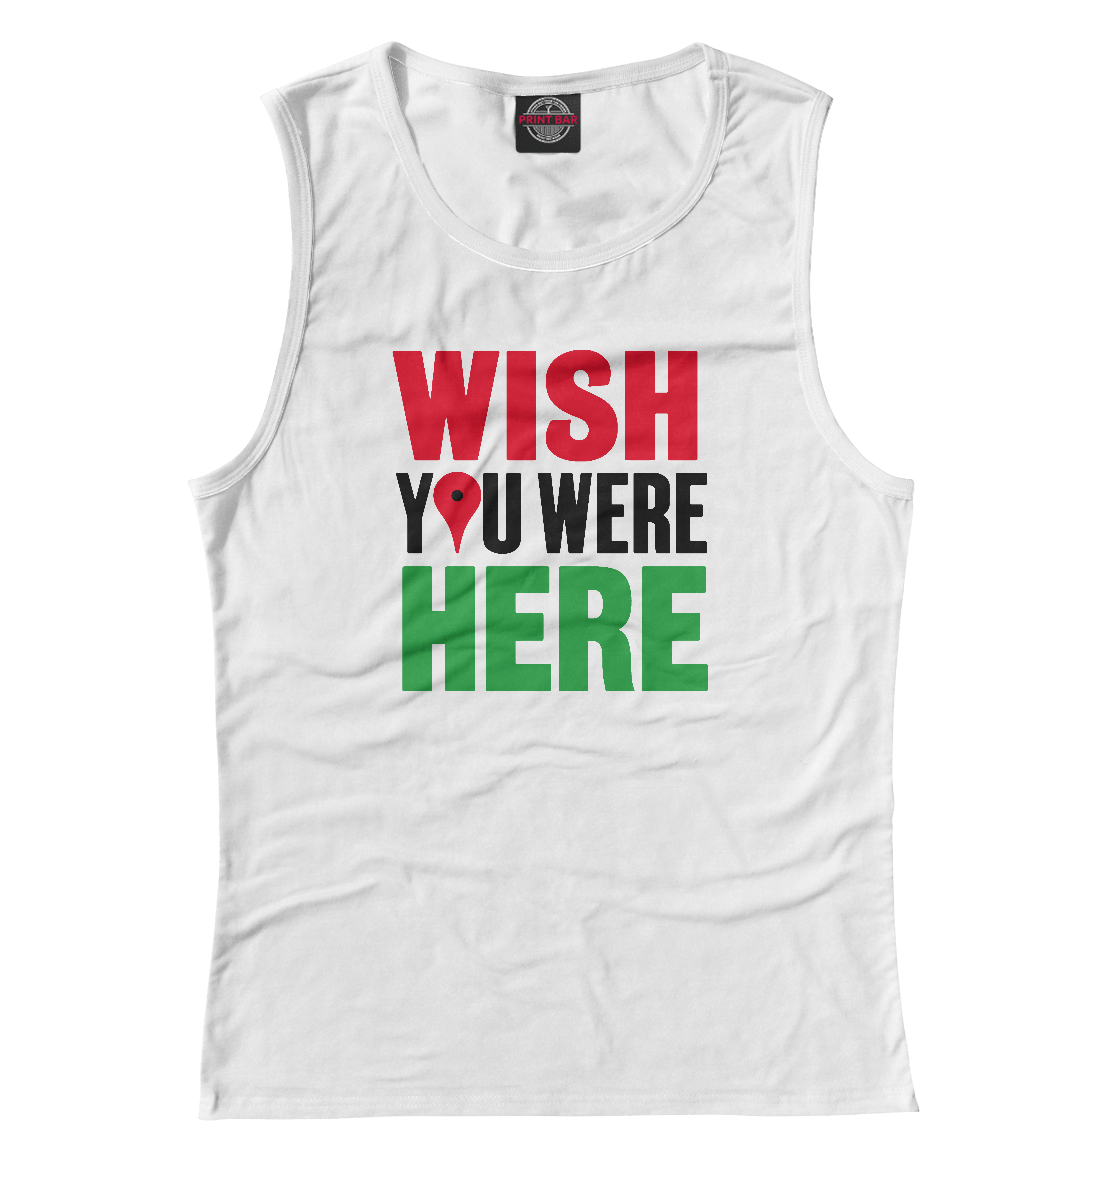 Wish you were here недорого